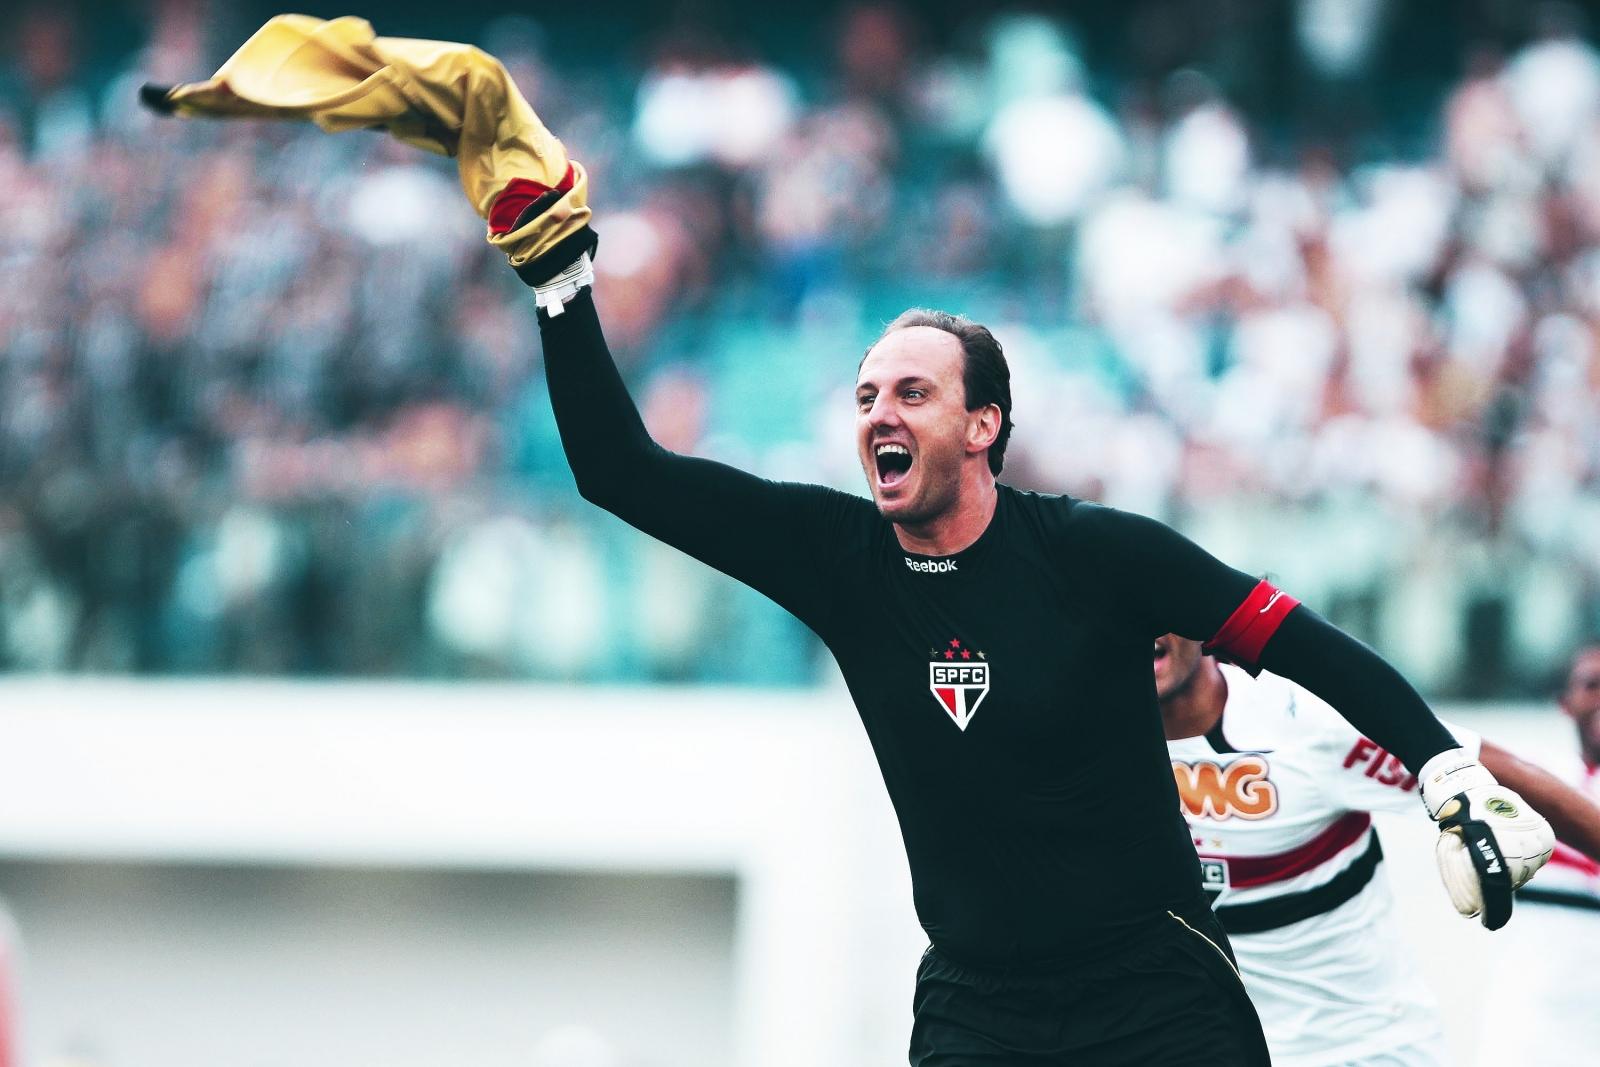 Rogerio Ceni the goalkeeper who scored 132 goals